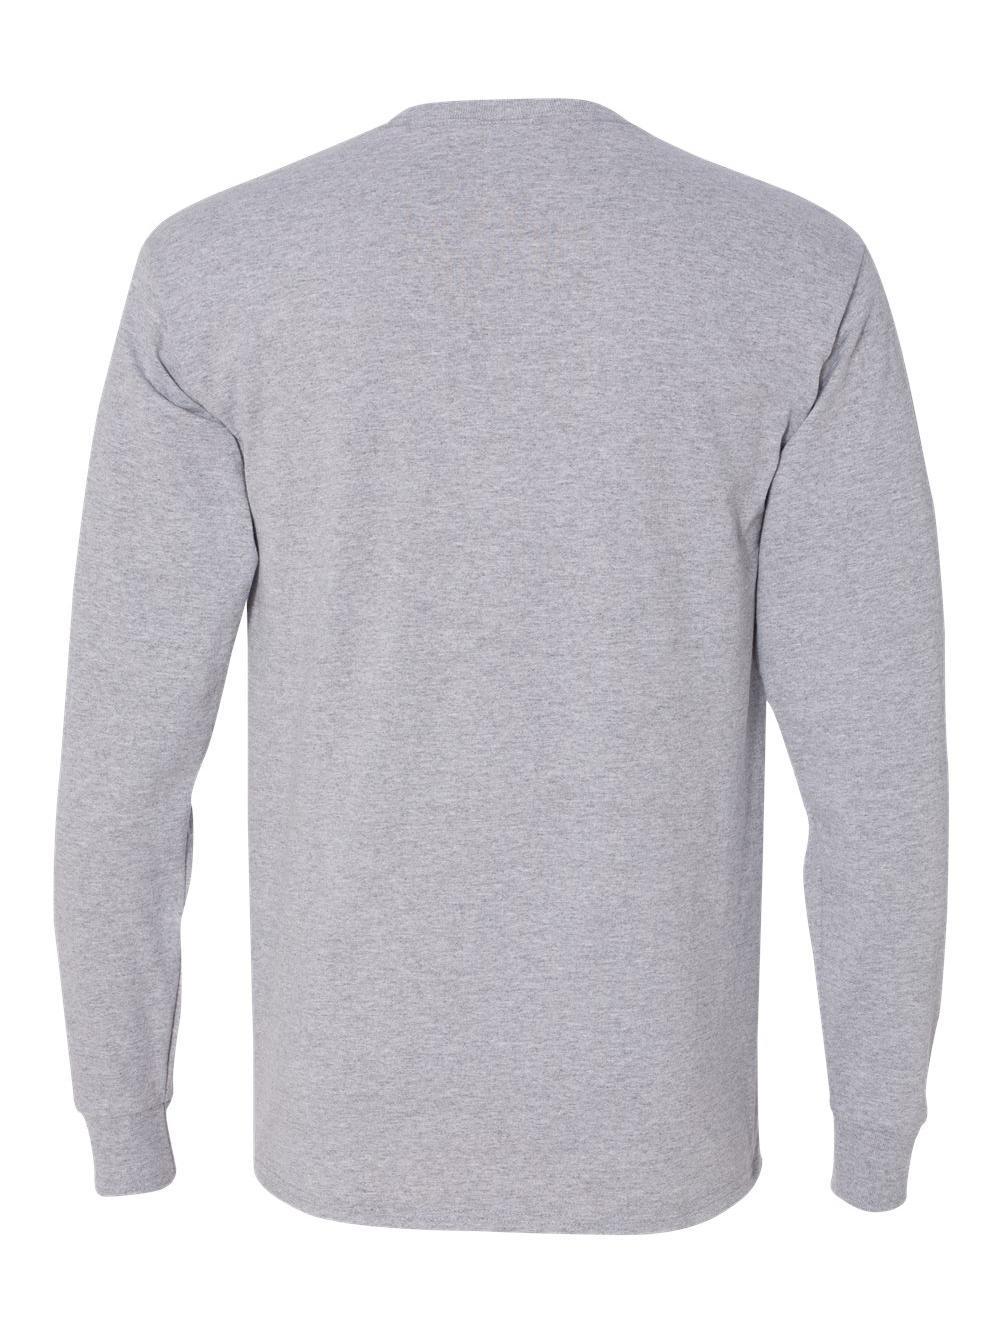 Jerzees-Dri-Power-Long-Sleeve-50-50-T-Shirt-29LSR thumbnail 7